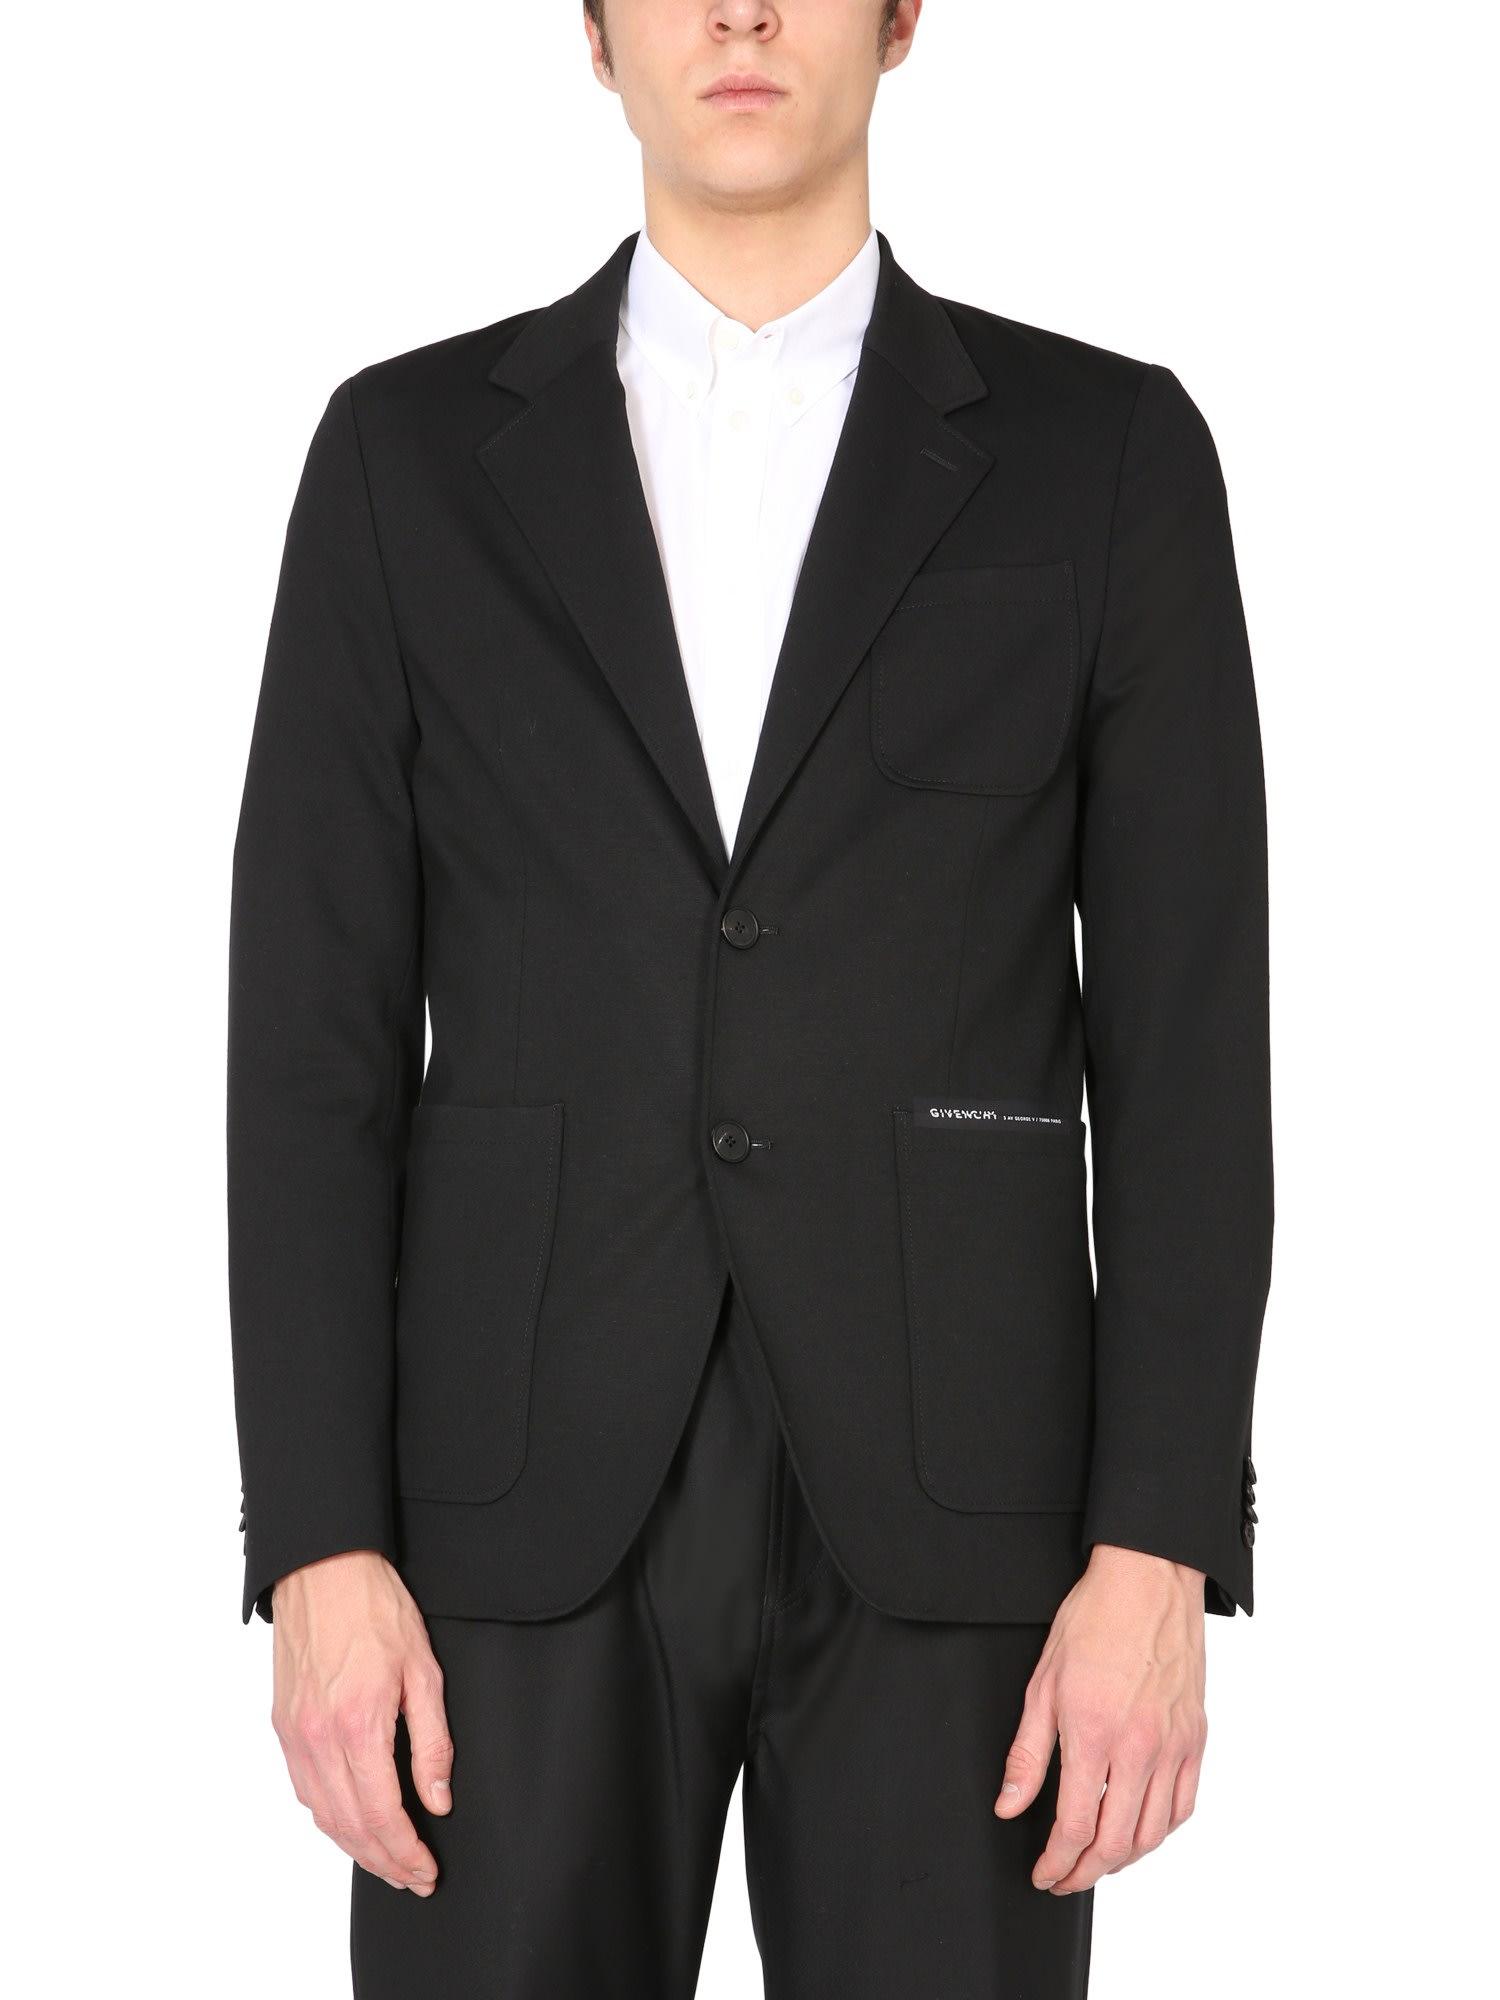 Givenchy Clothing SINGLE-BREASTED JACKET WITH LOGO